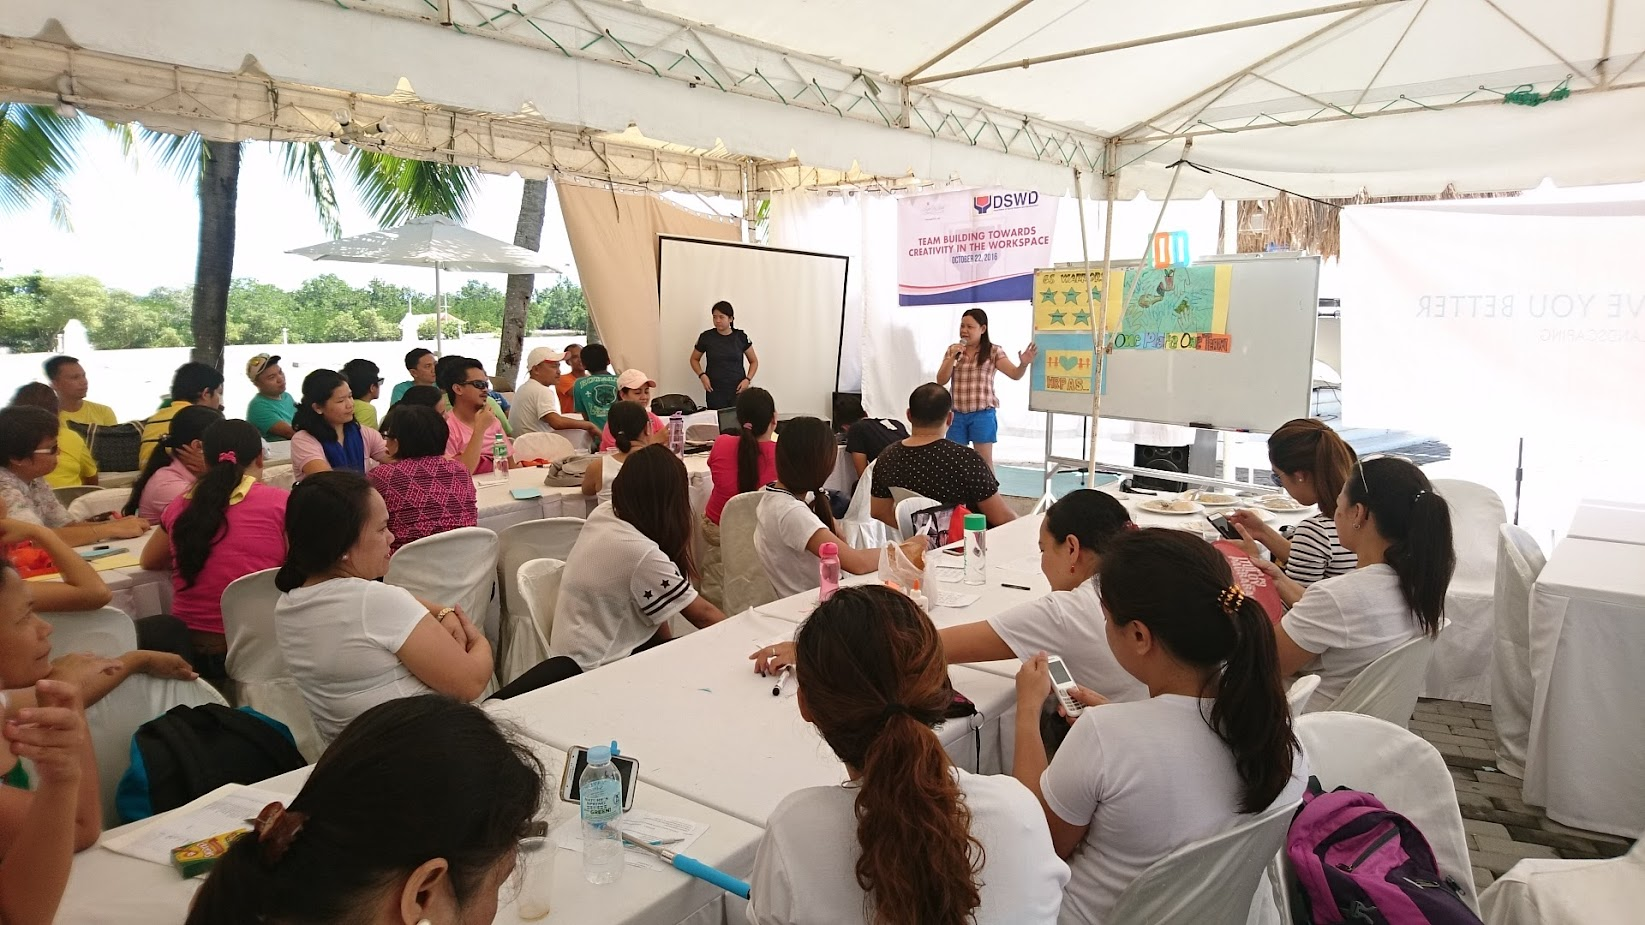 Department of Social Welfare and Development or DSWD Cebu 2016 team building in Lapulapu City Mactan Island Cebu Central Visayas Philippines